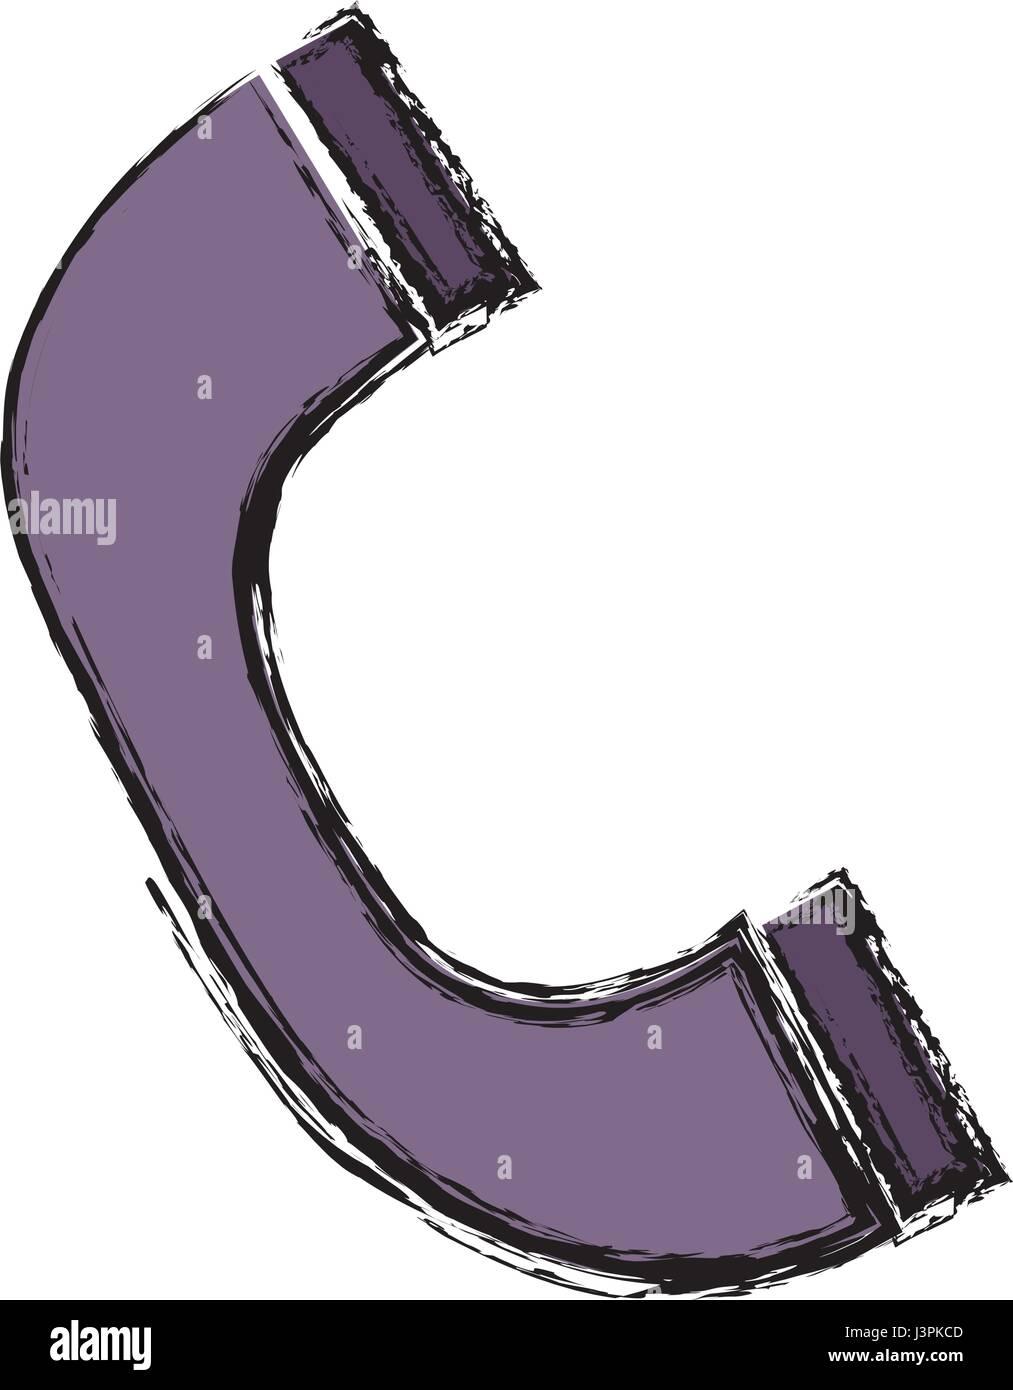 phone handset icon - Stock Image